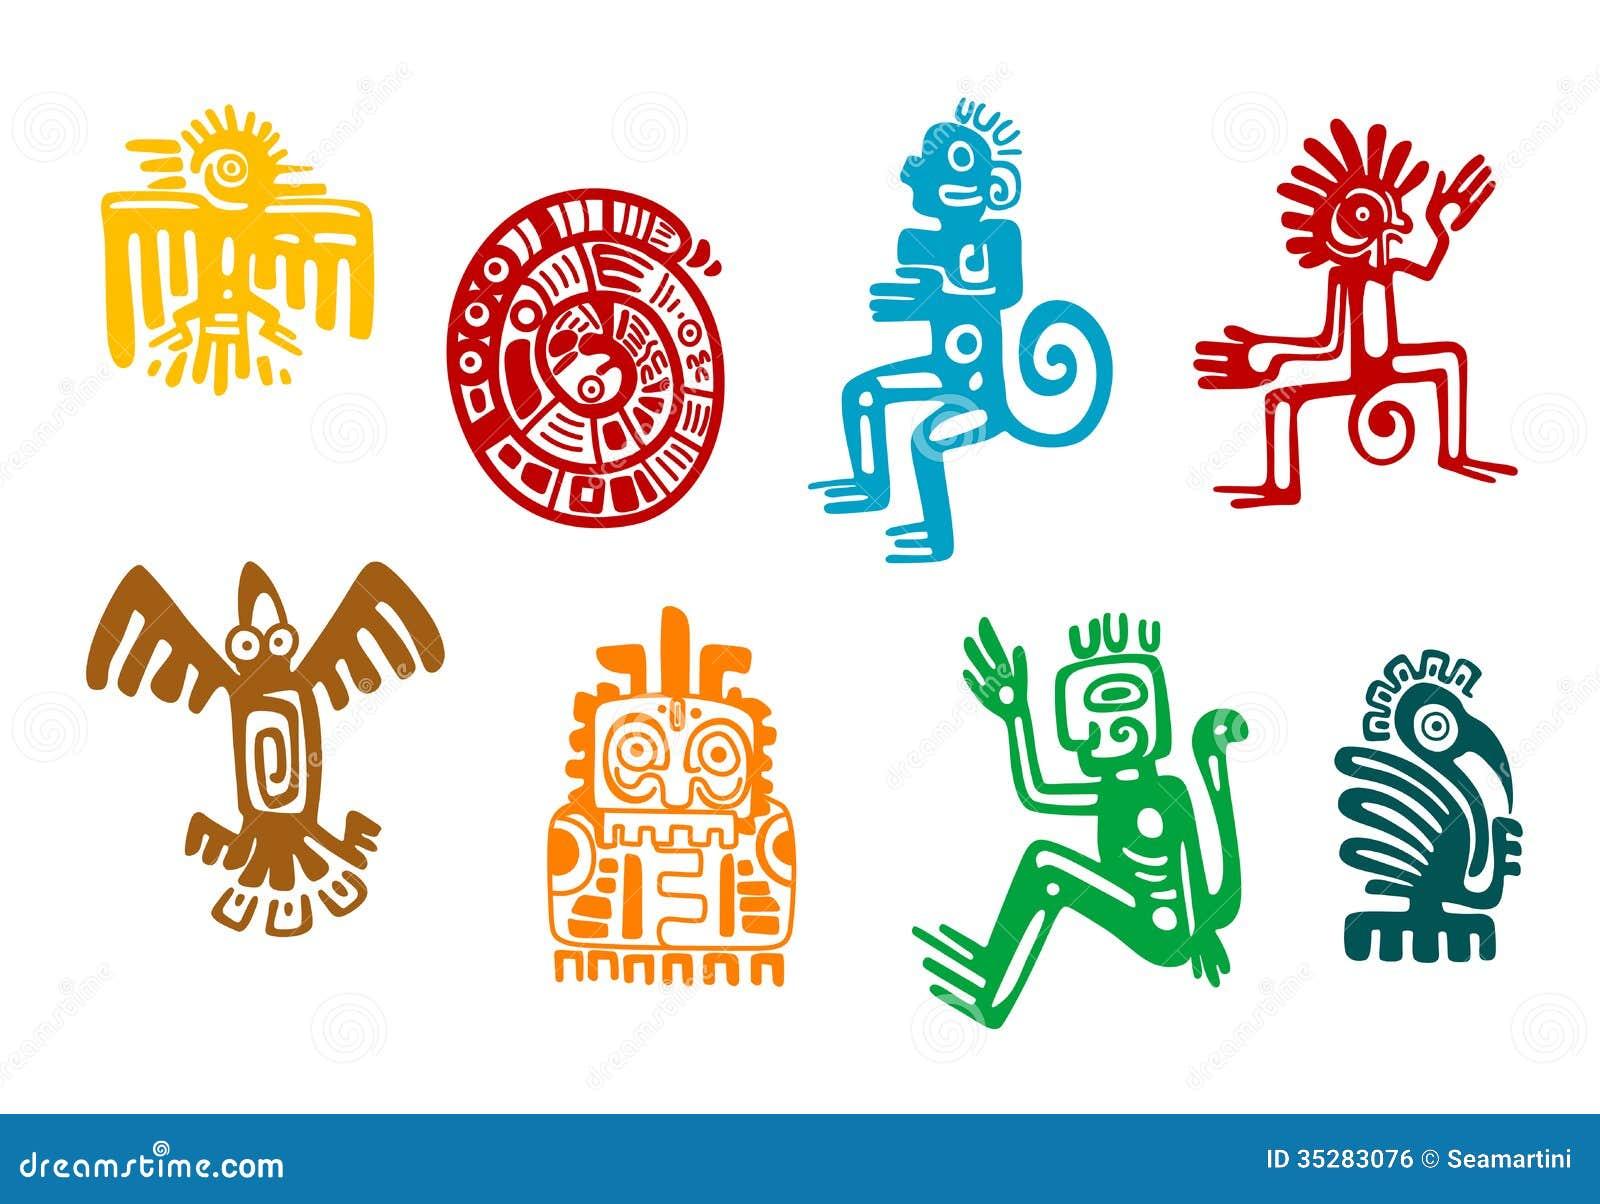 Abstract maya and aztec art symbols stock vector illustration of abstract maya and aztec art symbols biocorpaavc Gallery